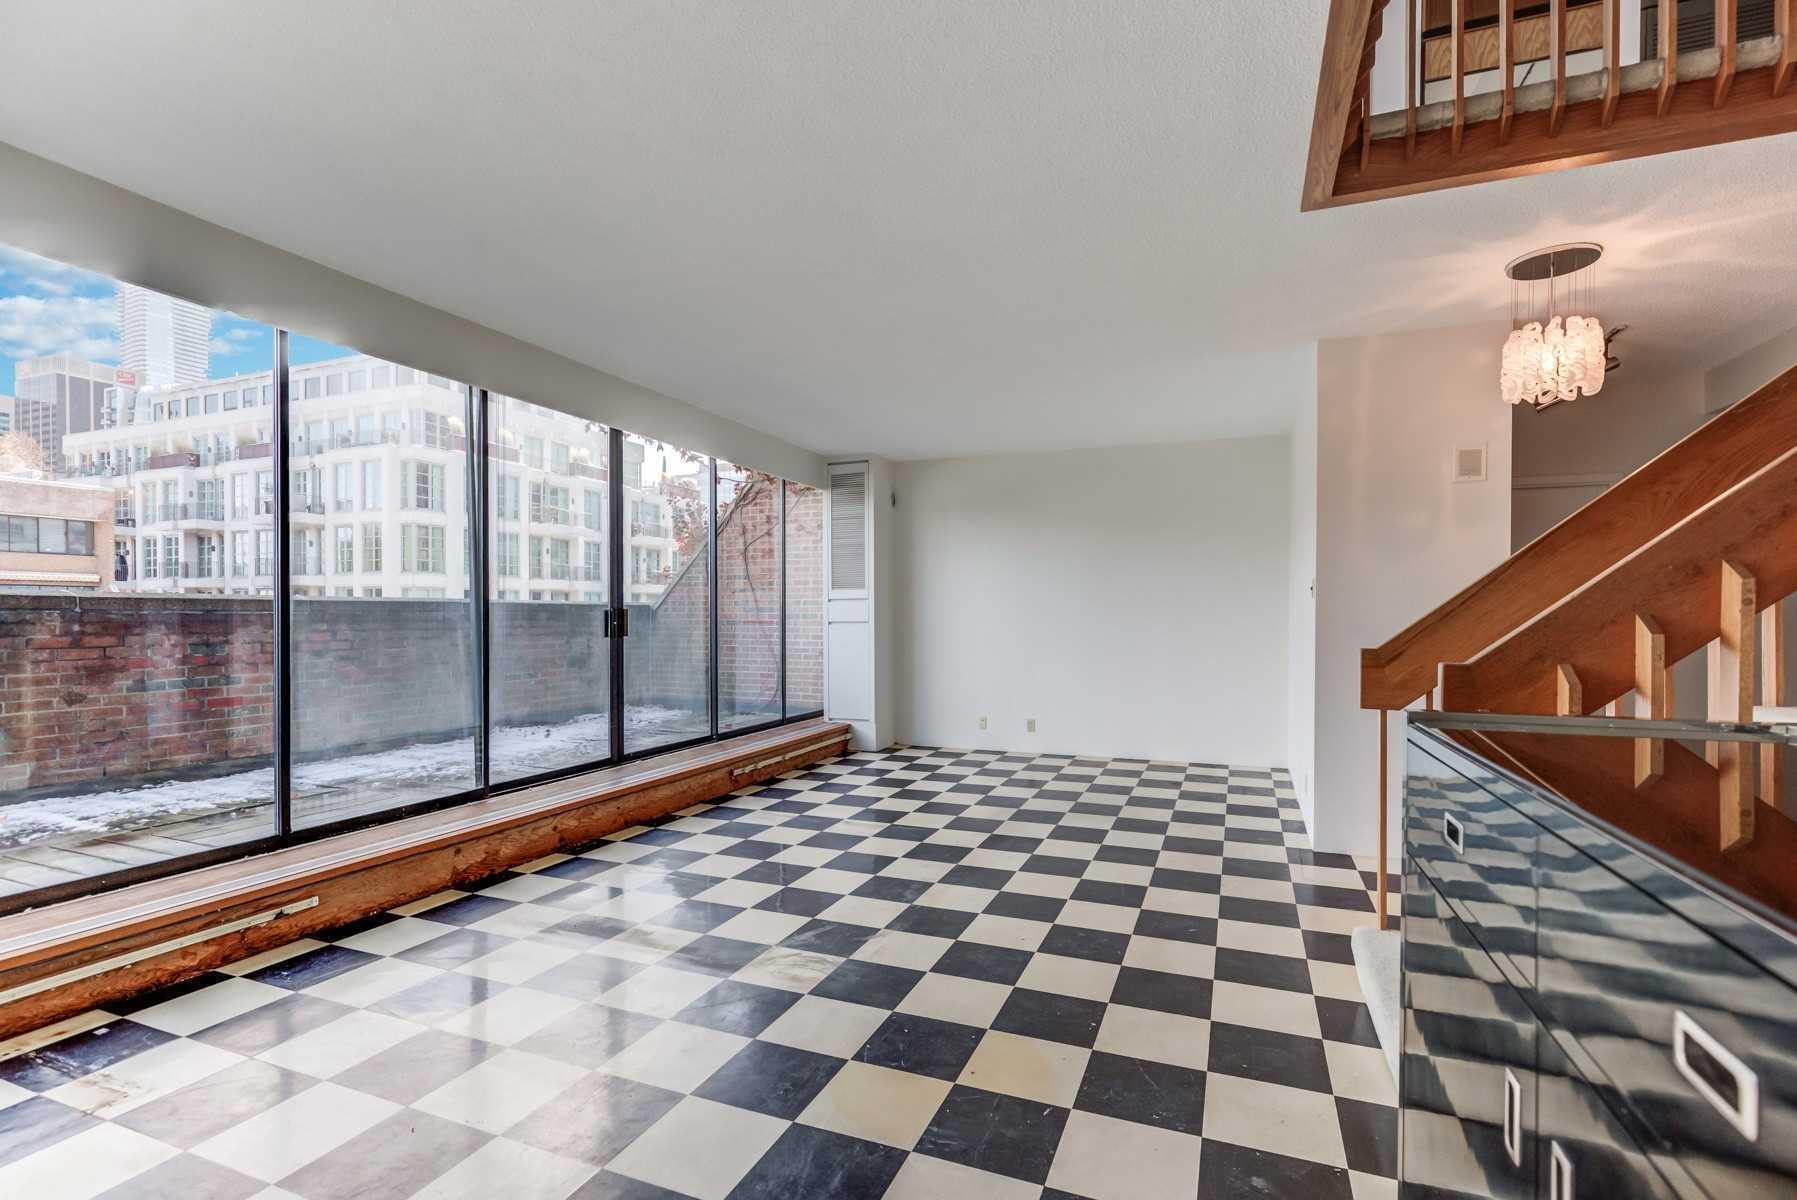 607 - 55A Avenue Rd - Annex Condo Apt for sale, 2 Bedrooms (C5185690) - #15